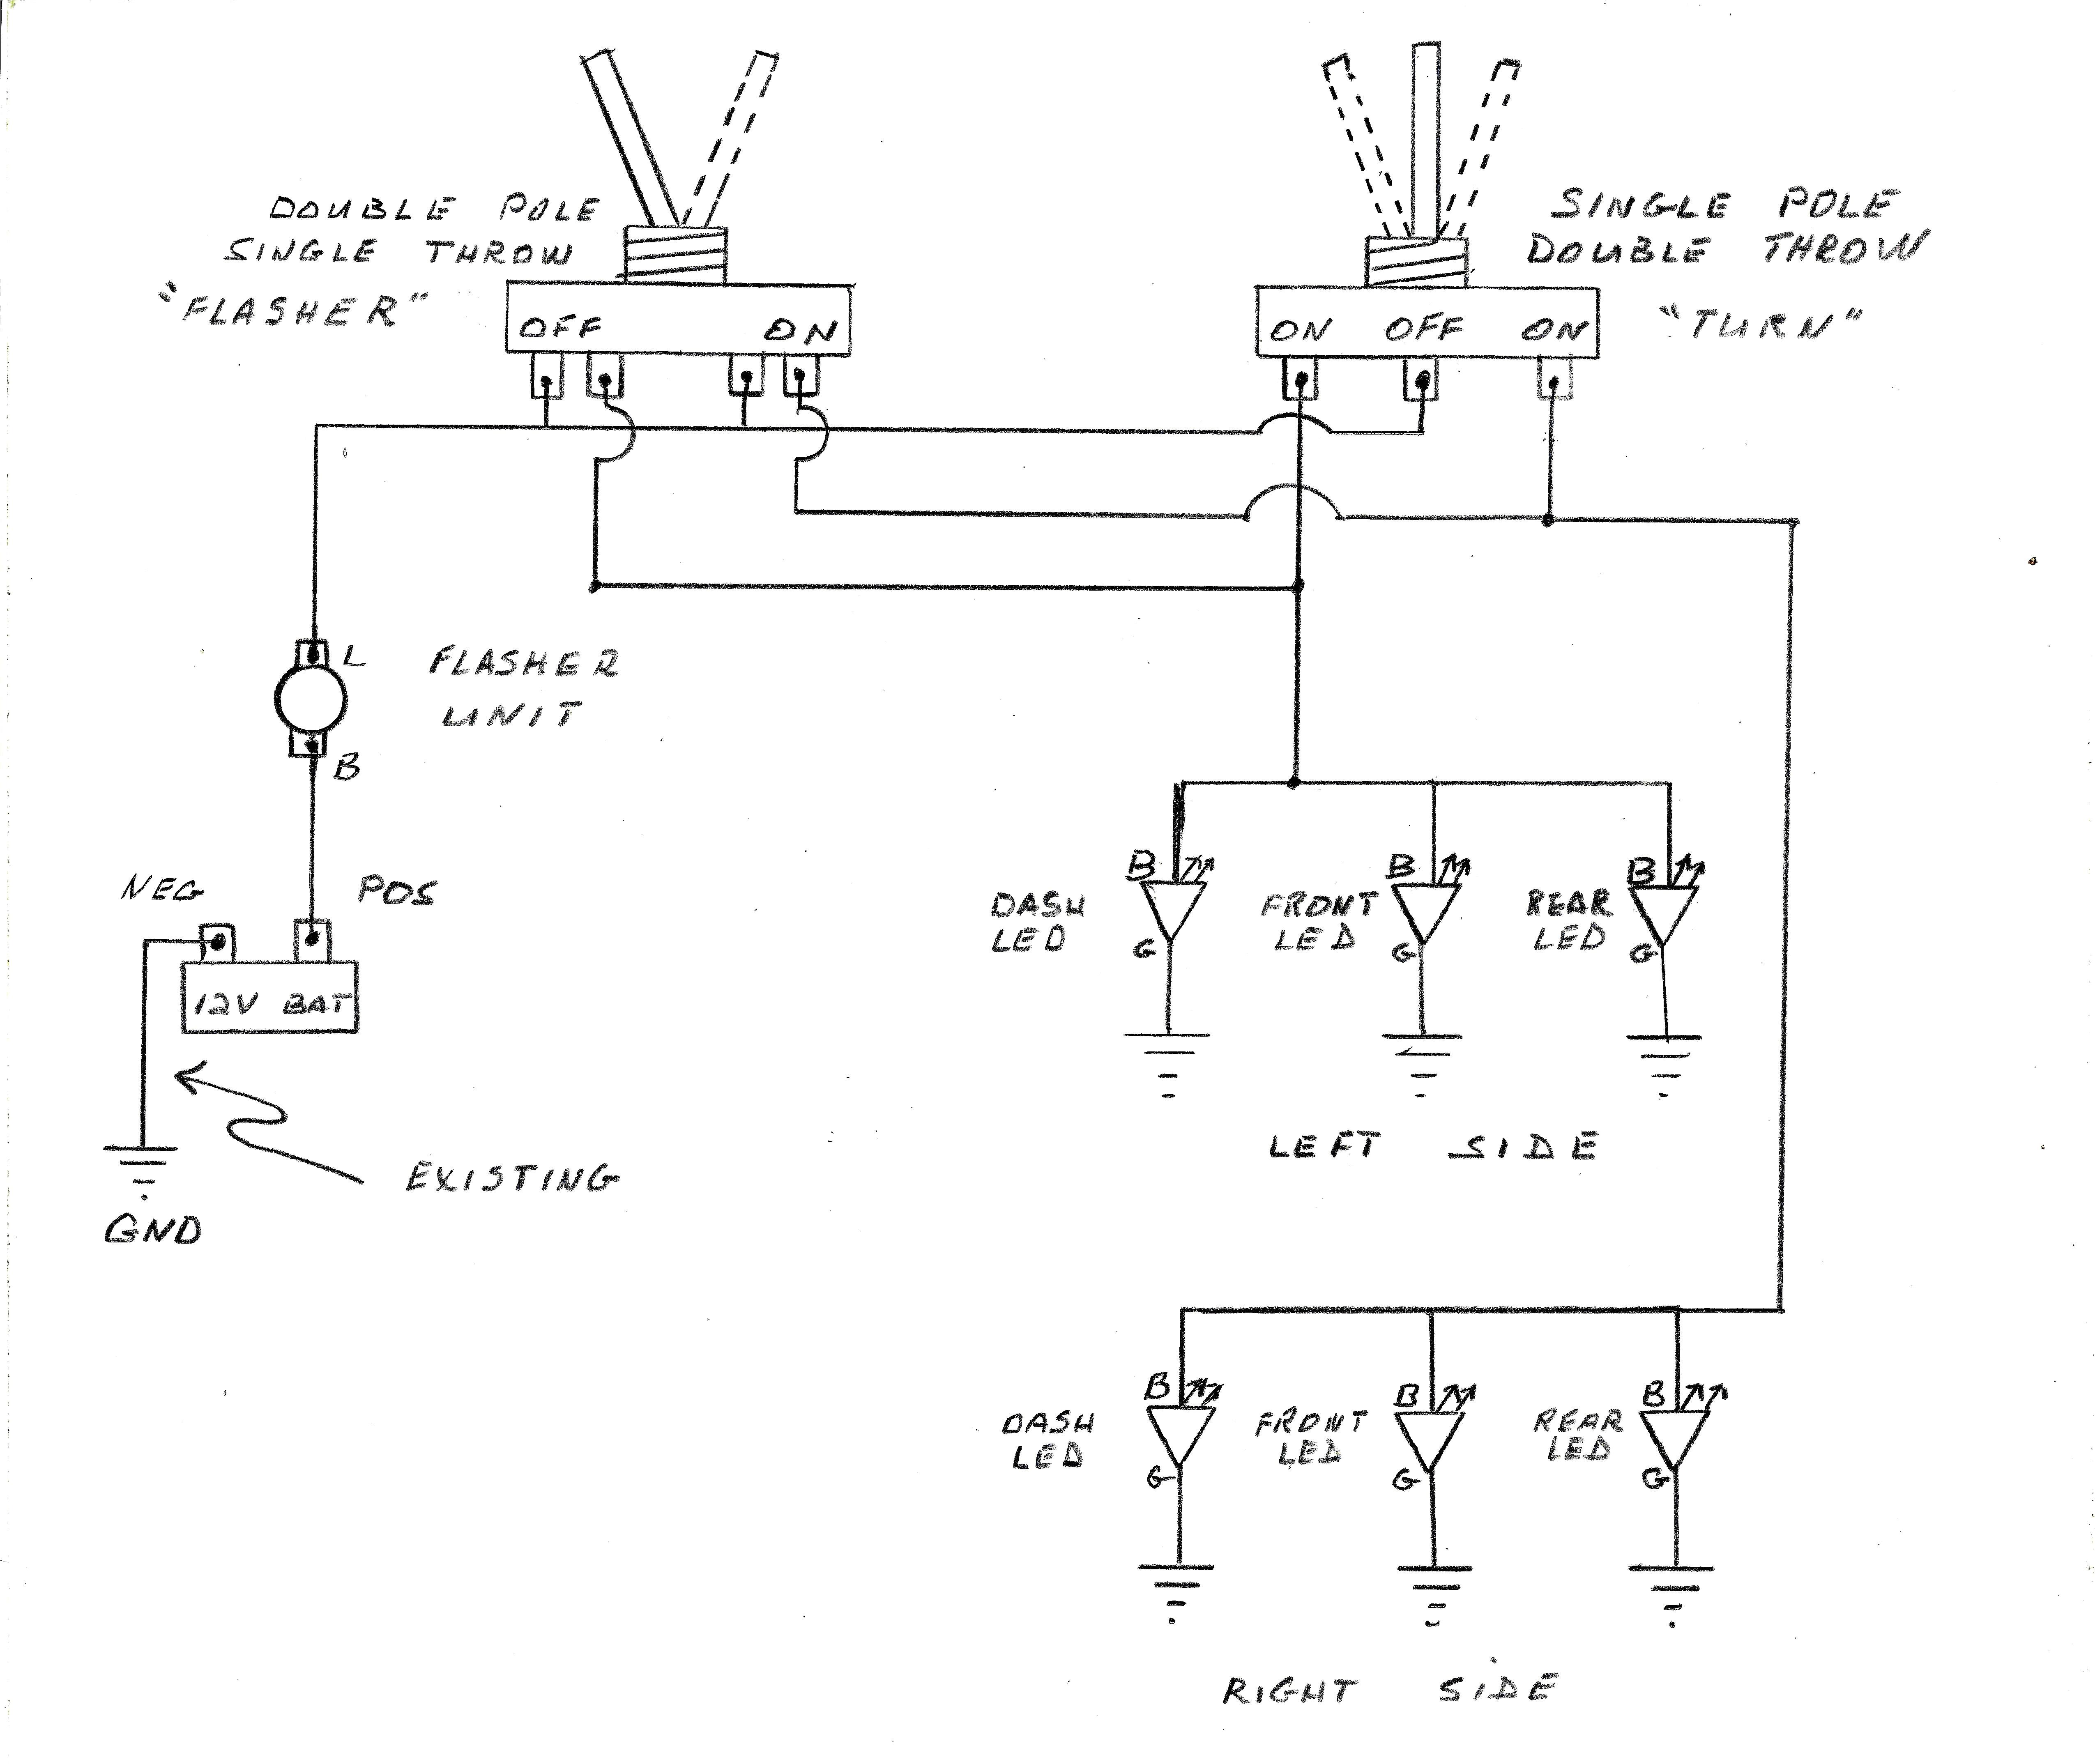 signal light flasher wiring diagram best of wiring diagrams for turn signal fresh diagram new sw em od random